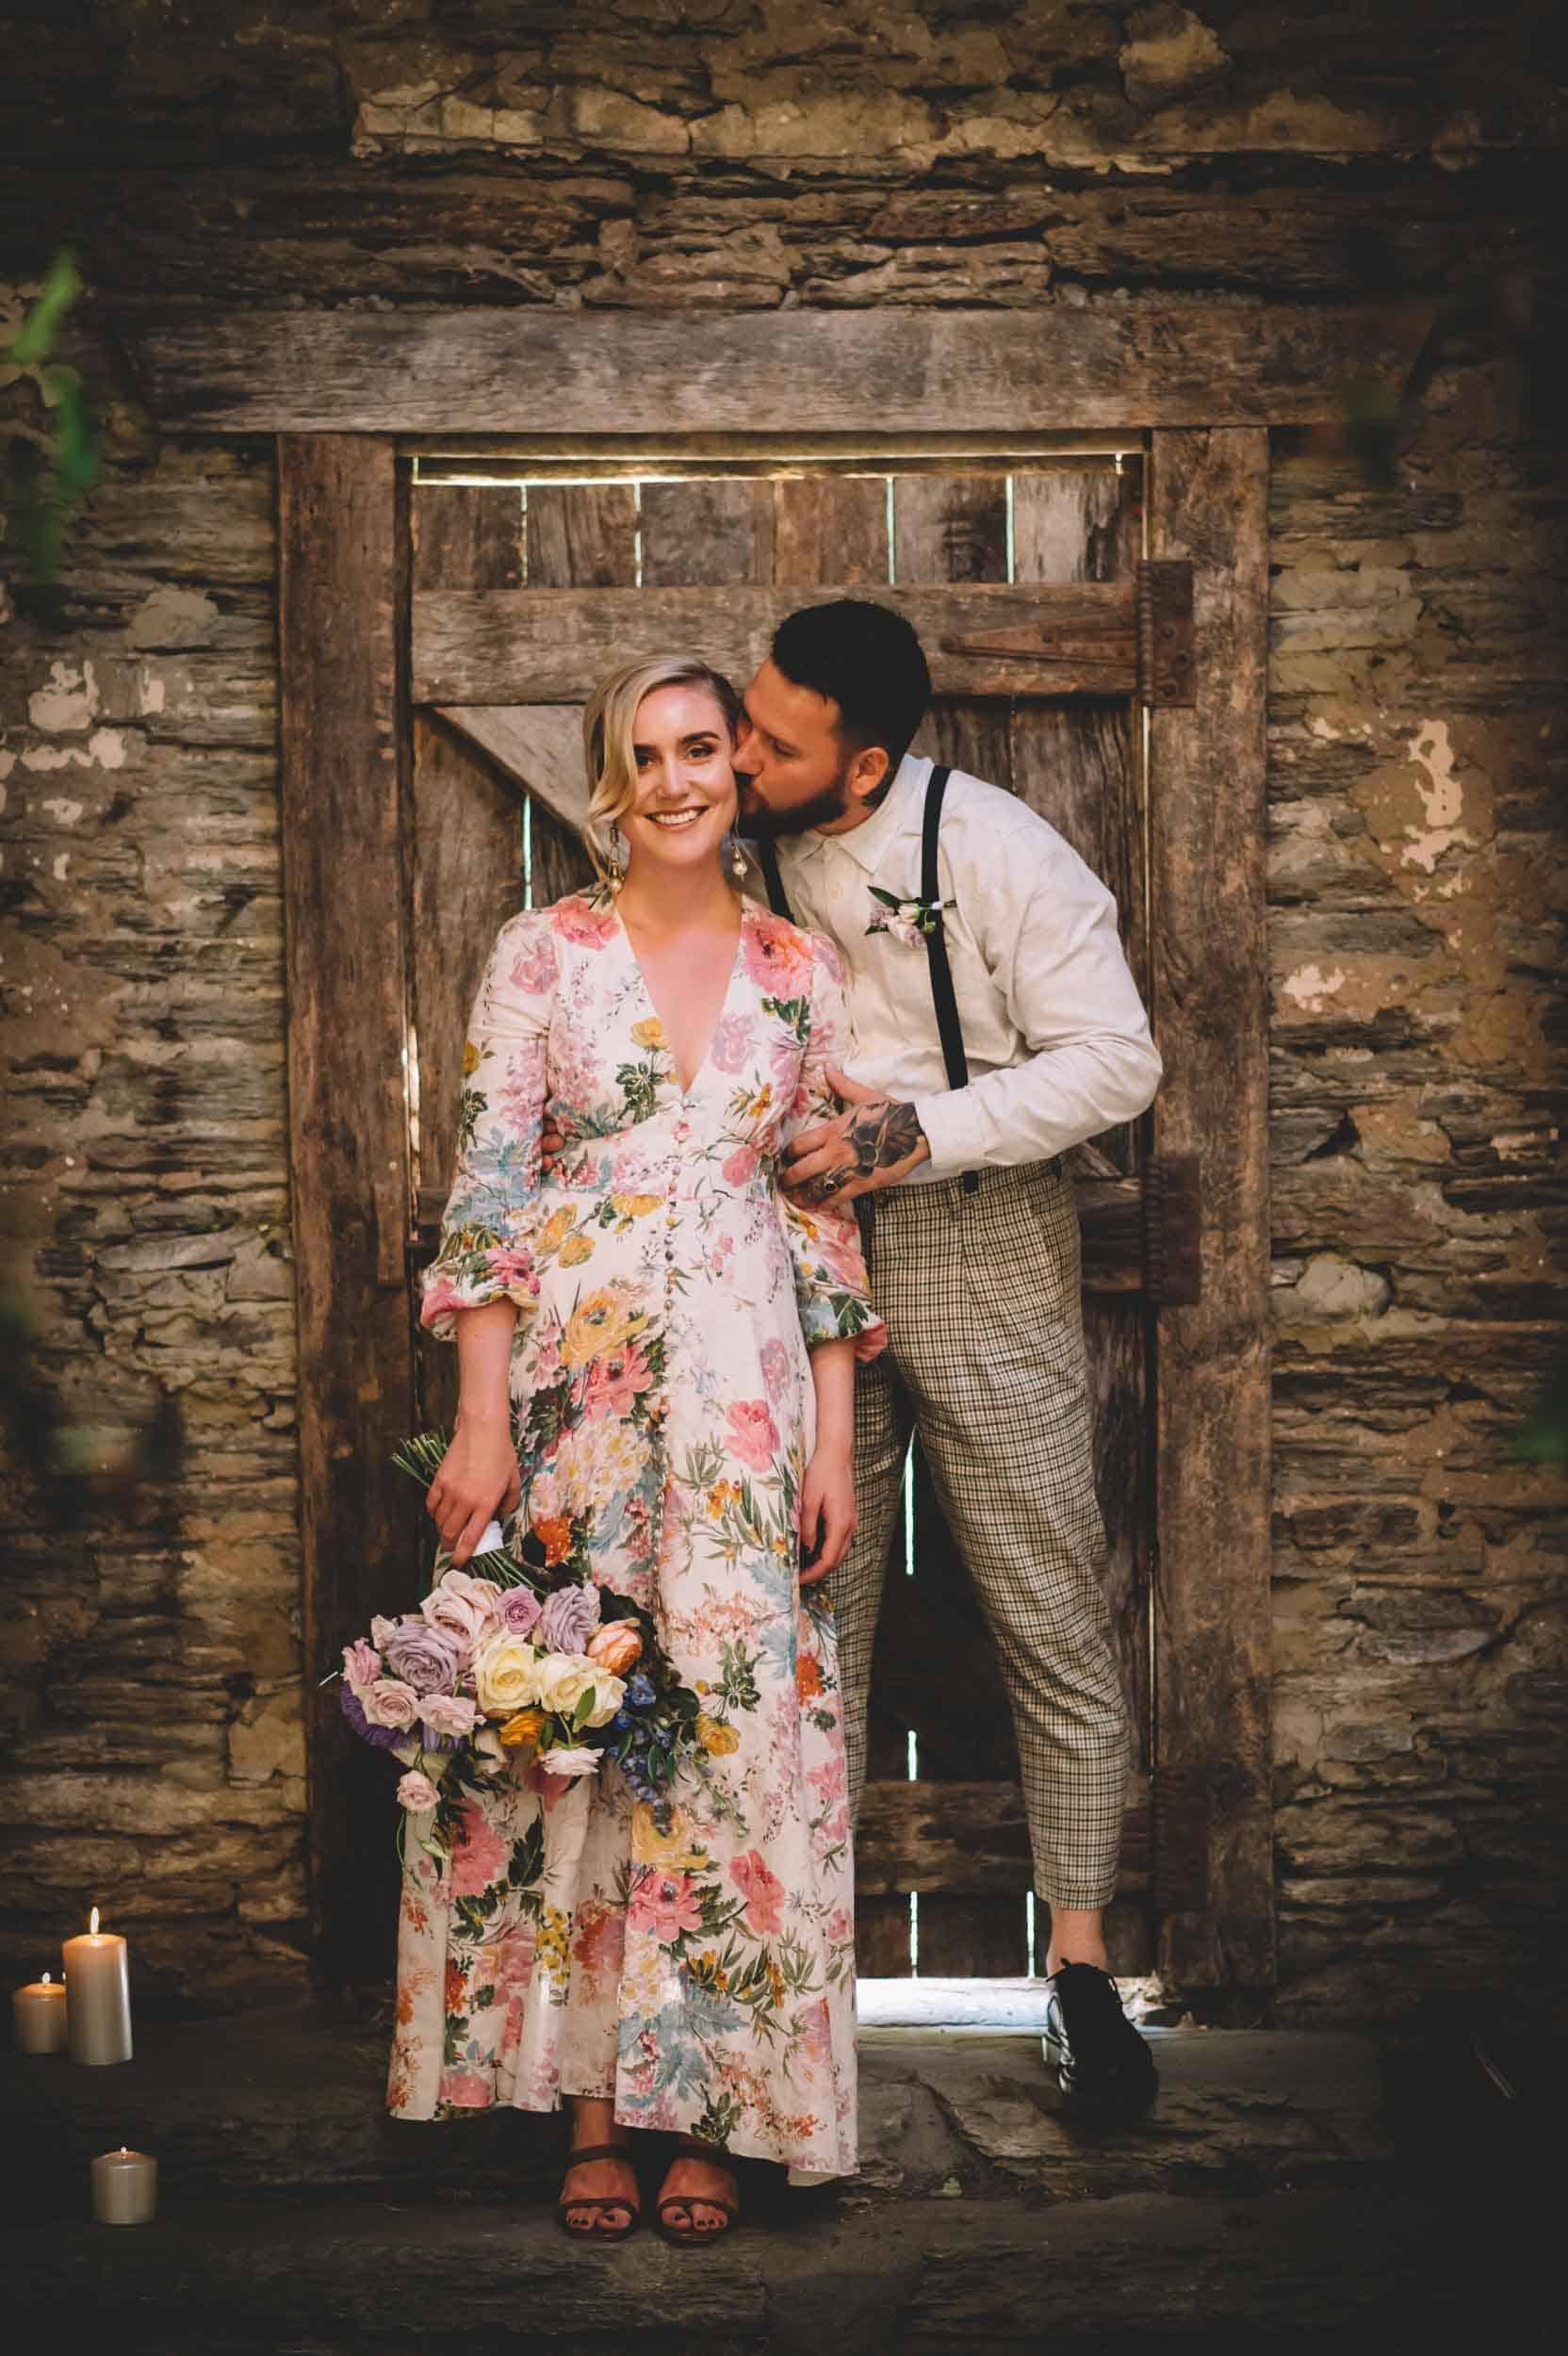 Nick & Nina's Thurlby Domain Elopement bride & groom photos stone stables